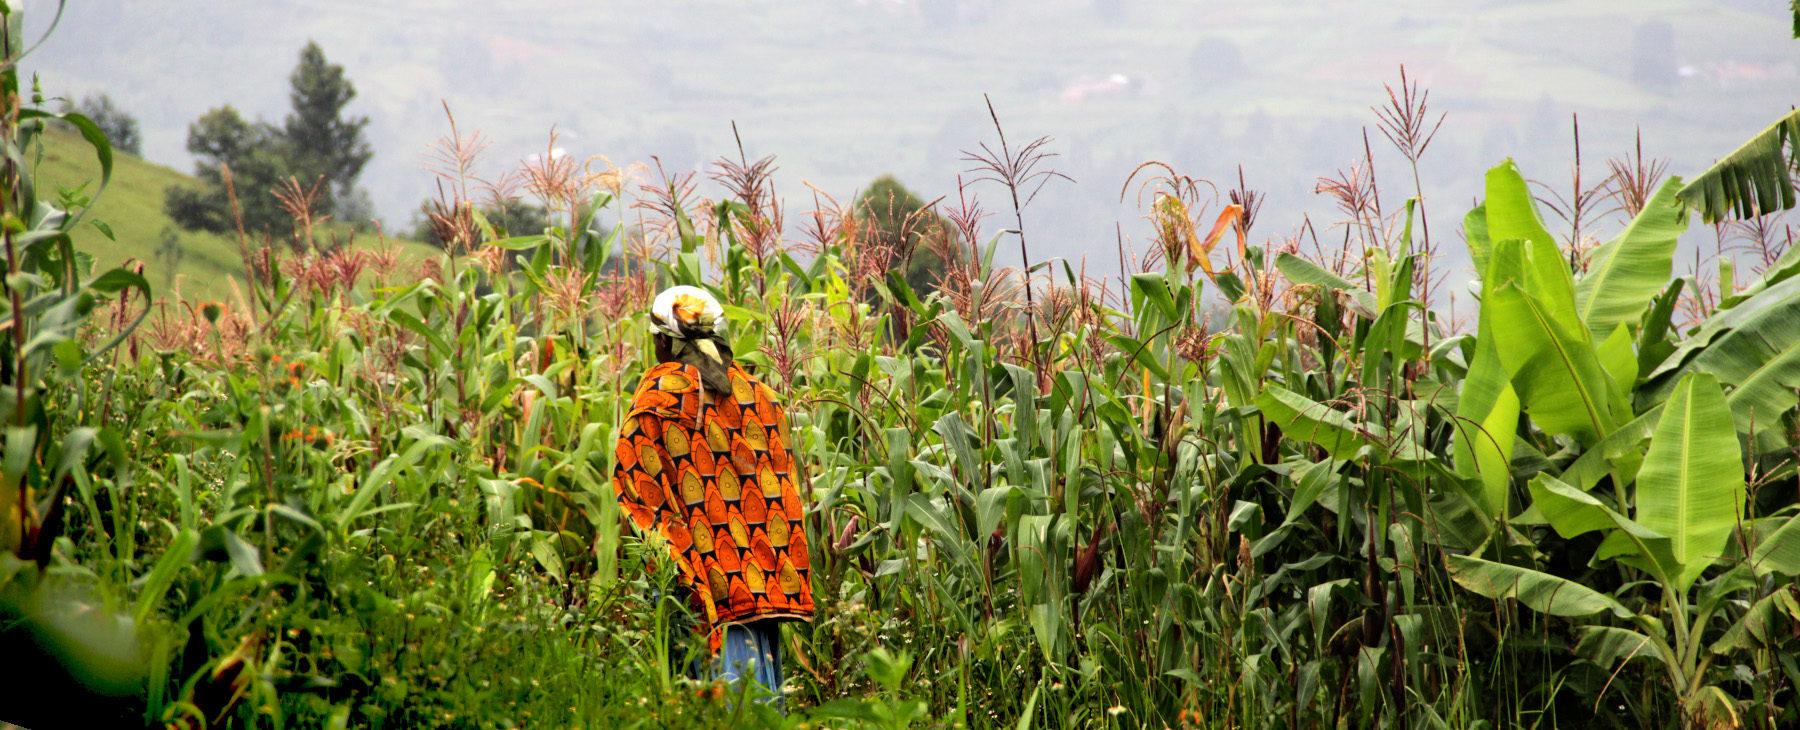 Condemnation of two Imbonerakure, an encouraging sign in Burundi?